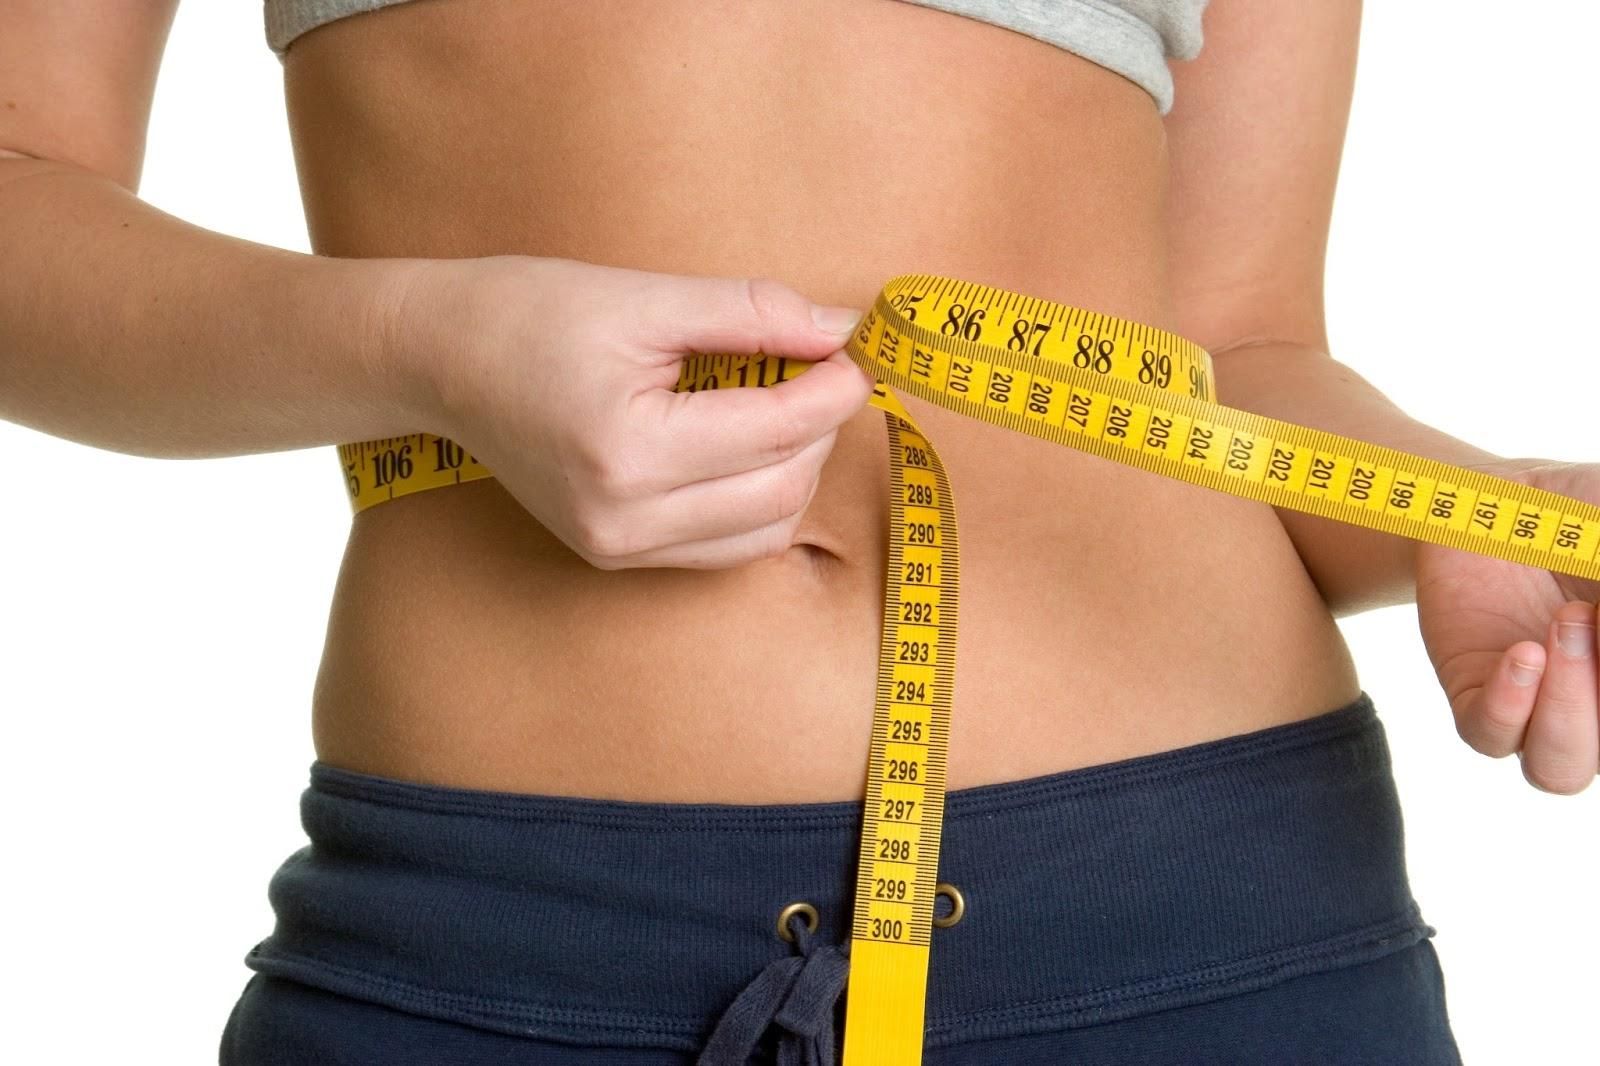 Herkesin kilo alma hikayesi ve nedenleri